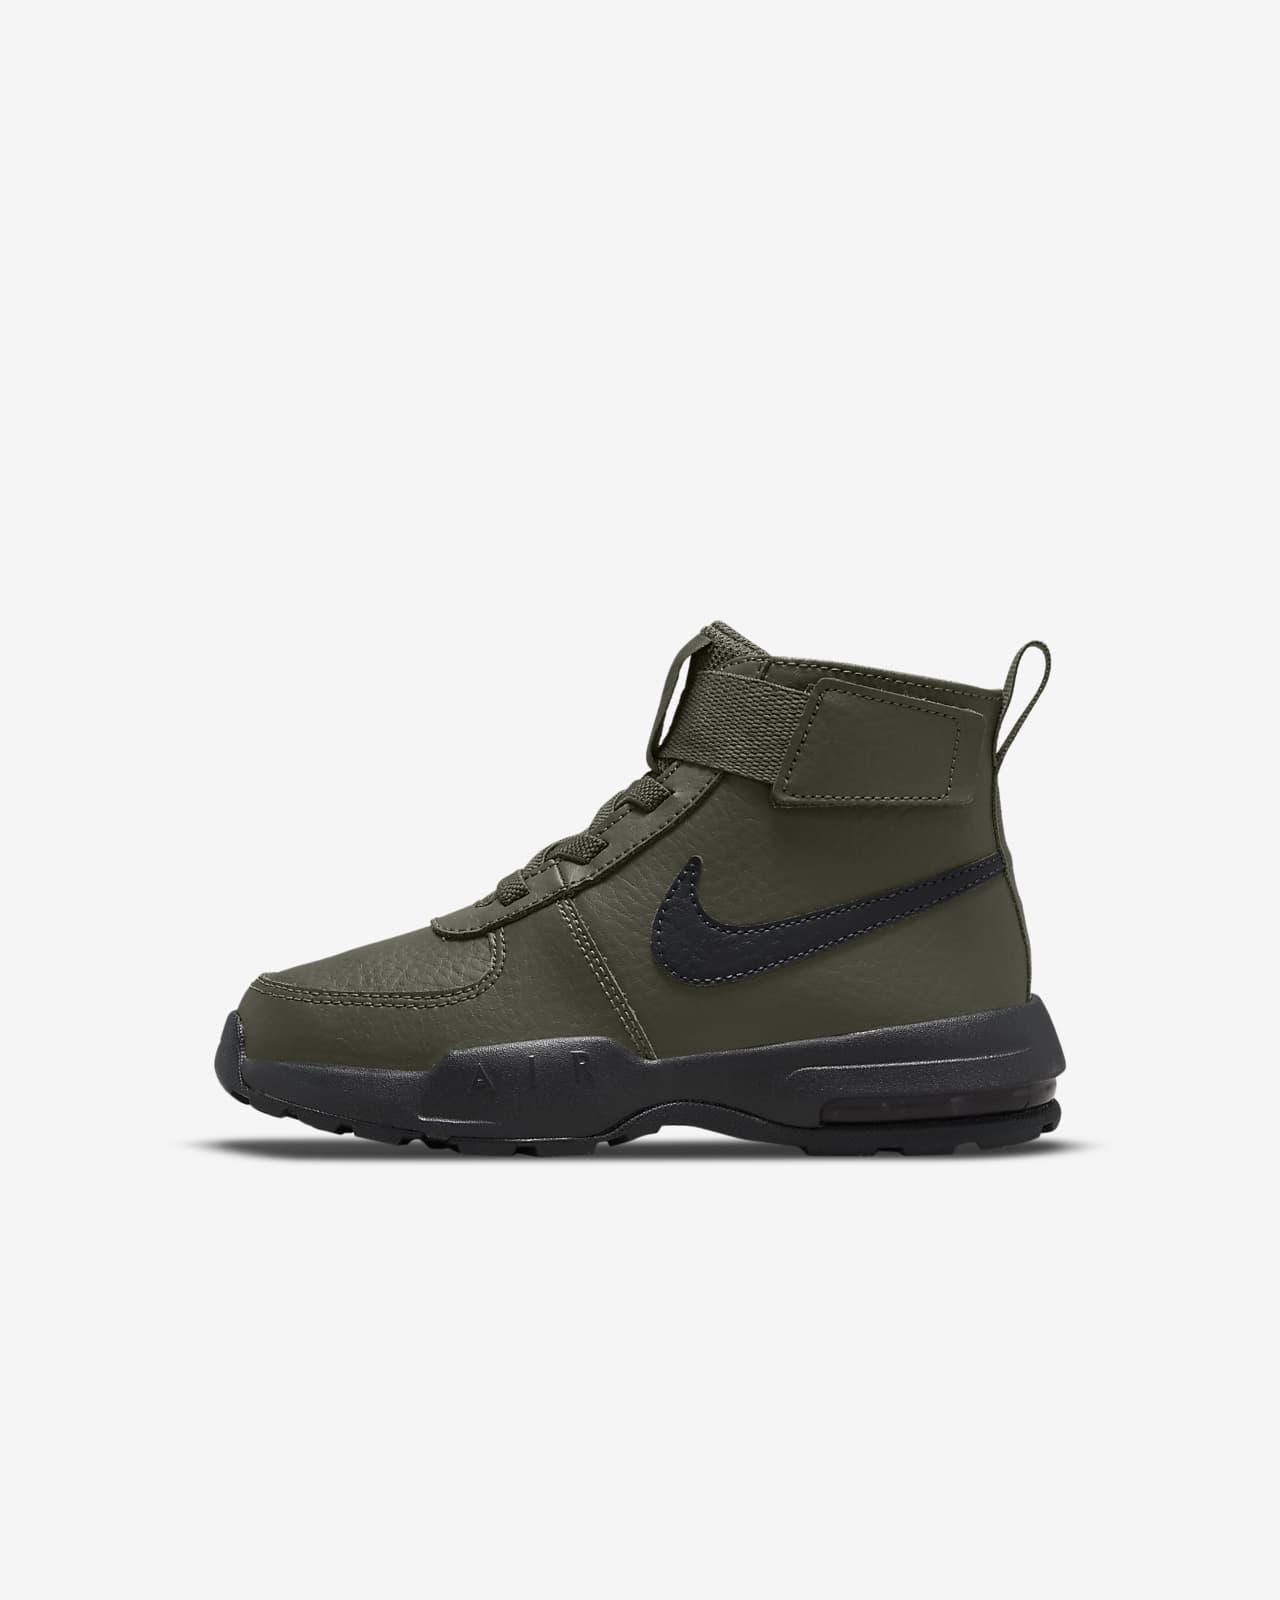 Nike Air Max Goaterra 2.0 Little Kids' Shoes